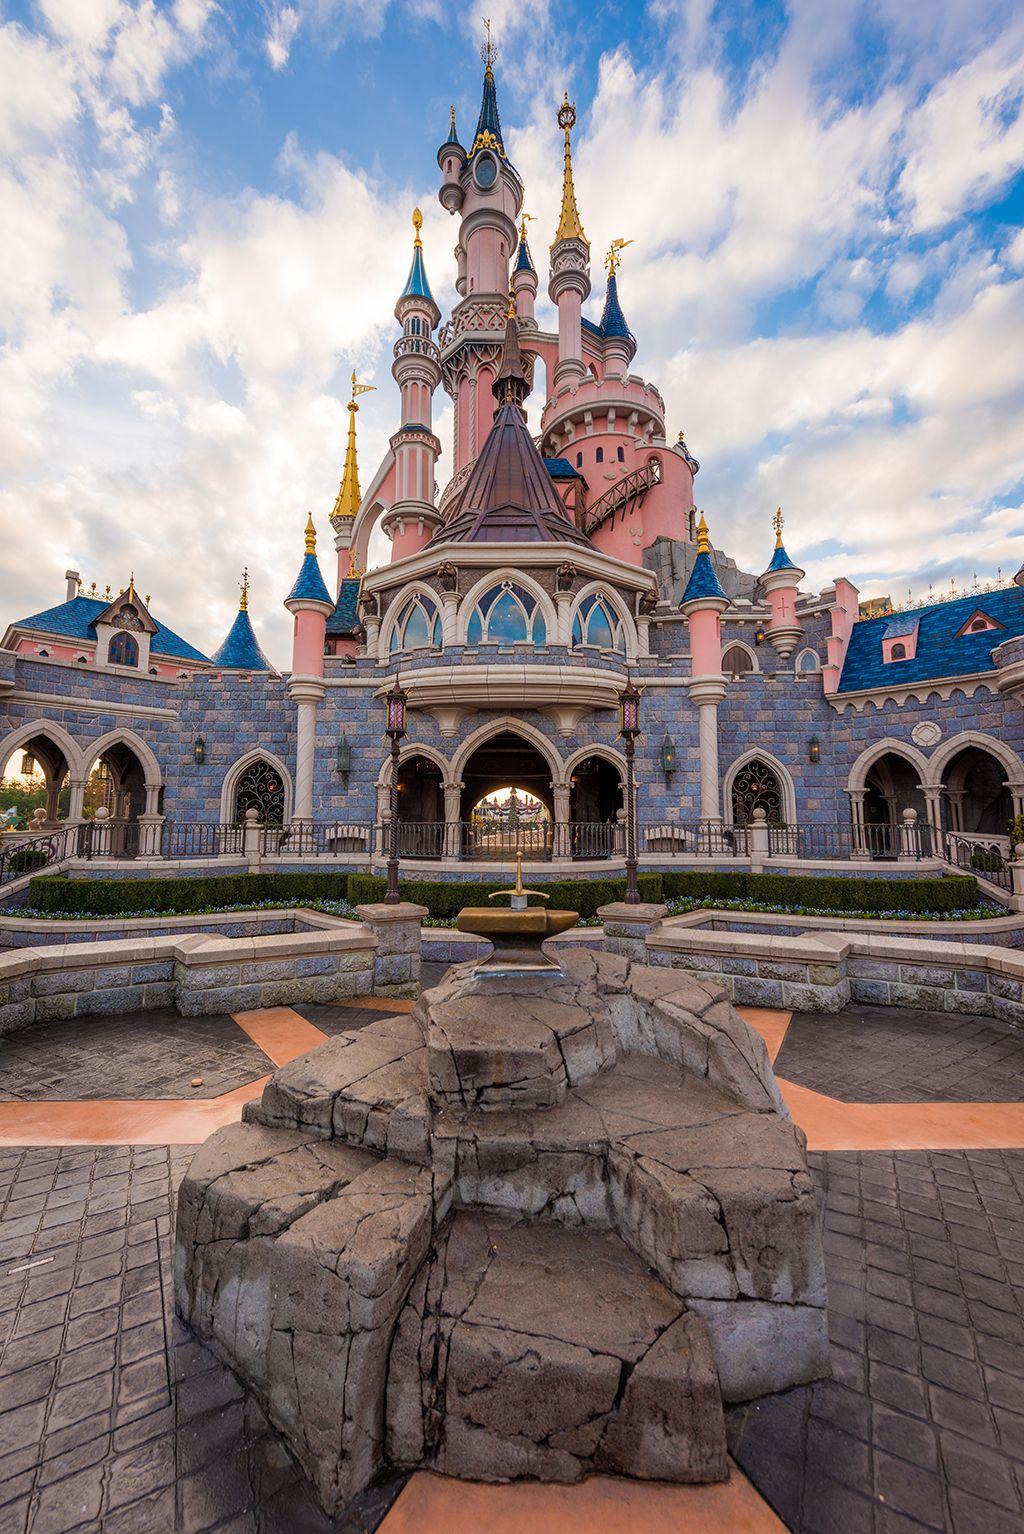 1-Day Disneyland Paris Plan & Itinerary (With images)   Disney paris, Paris travel